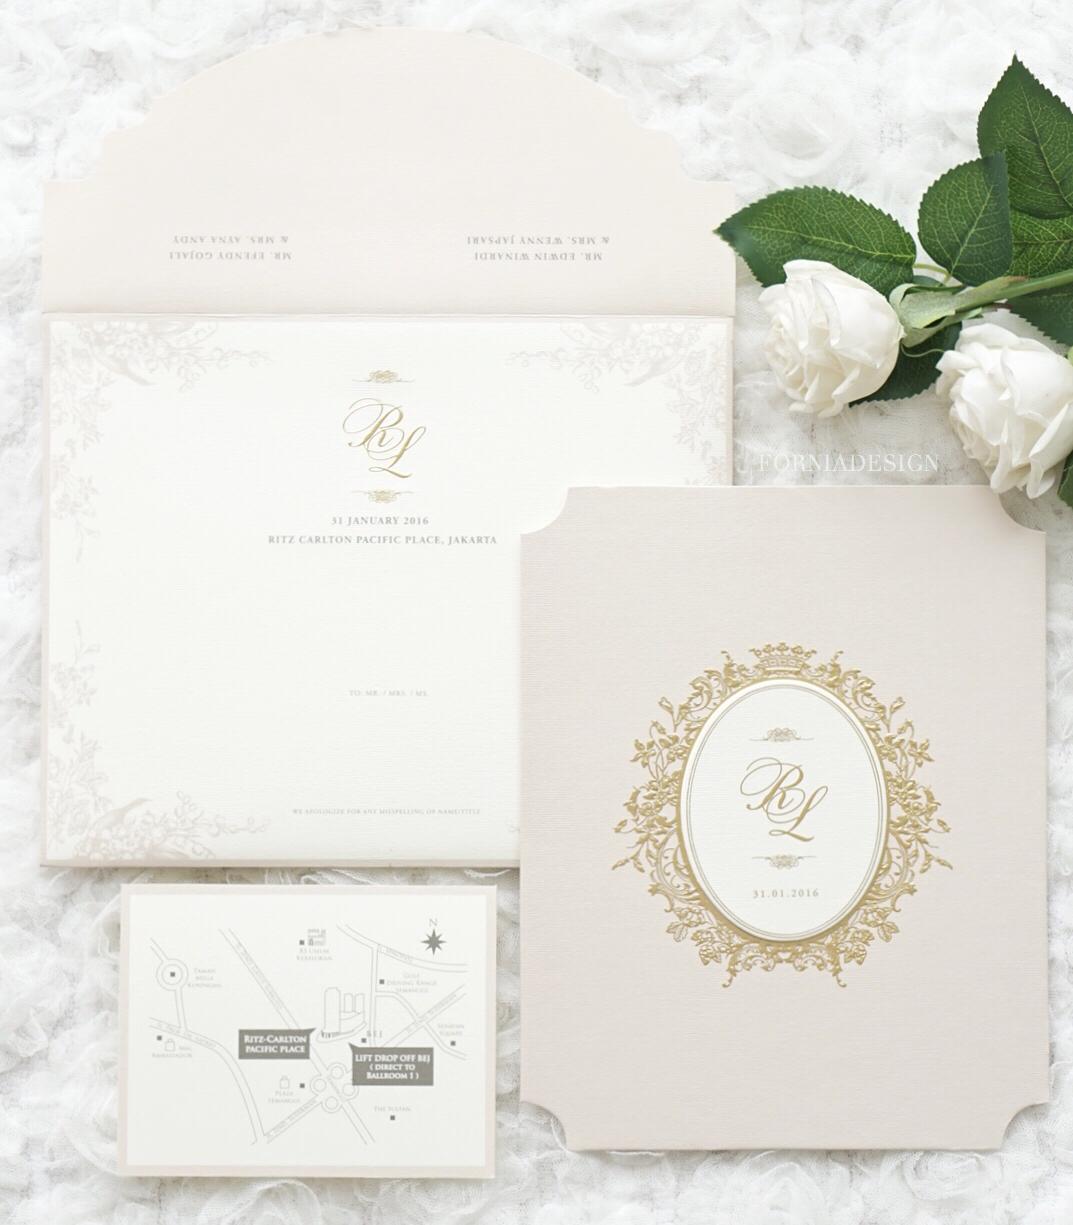 Randylily wedding invitation by fornia design invitation randylily wedding invitation by fornia design invitation bridestory stopboris Images